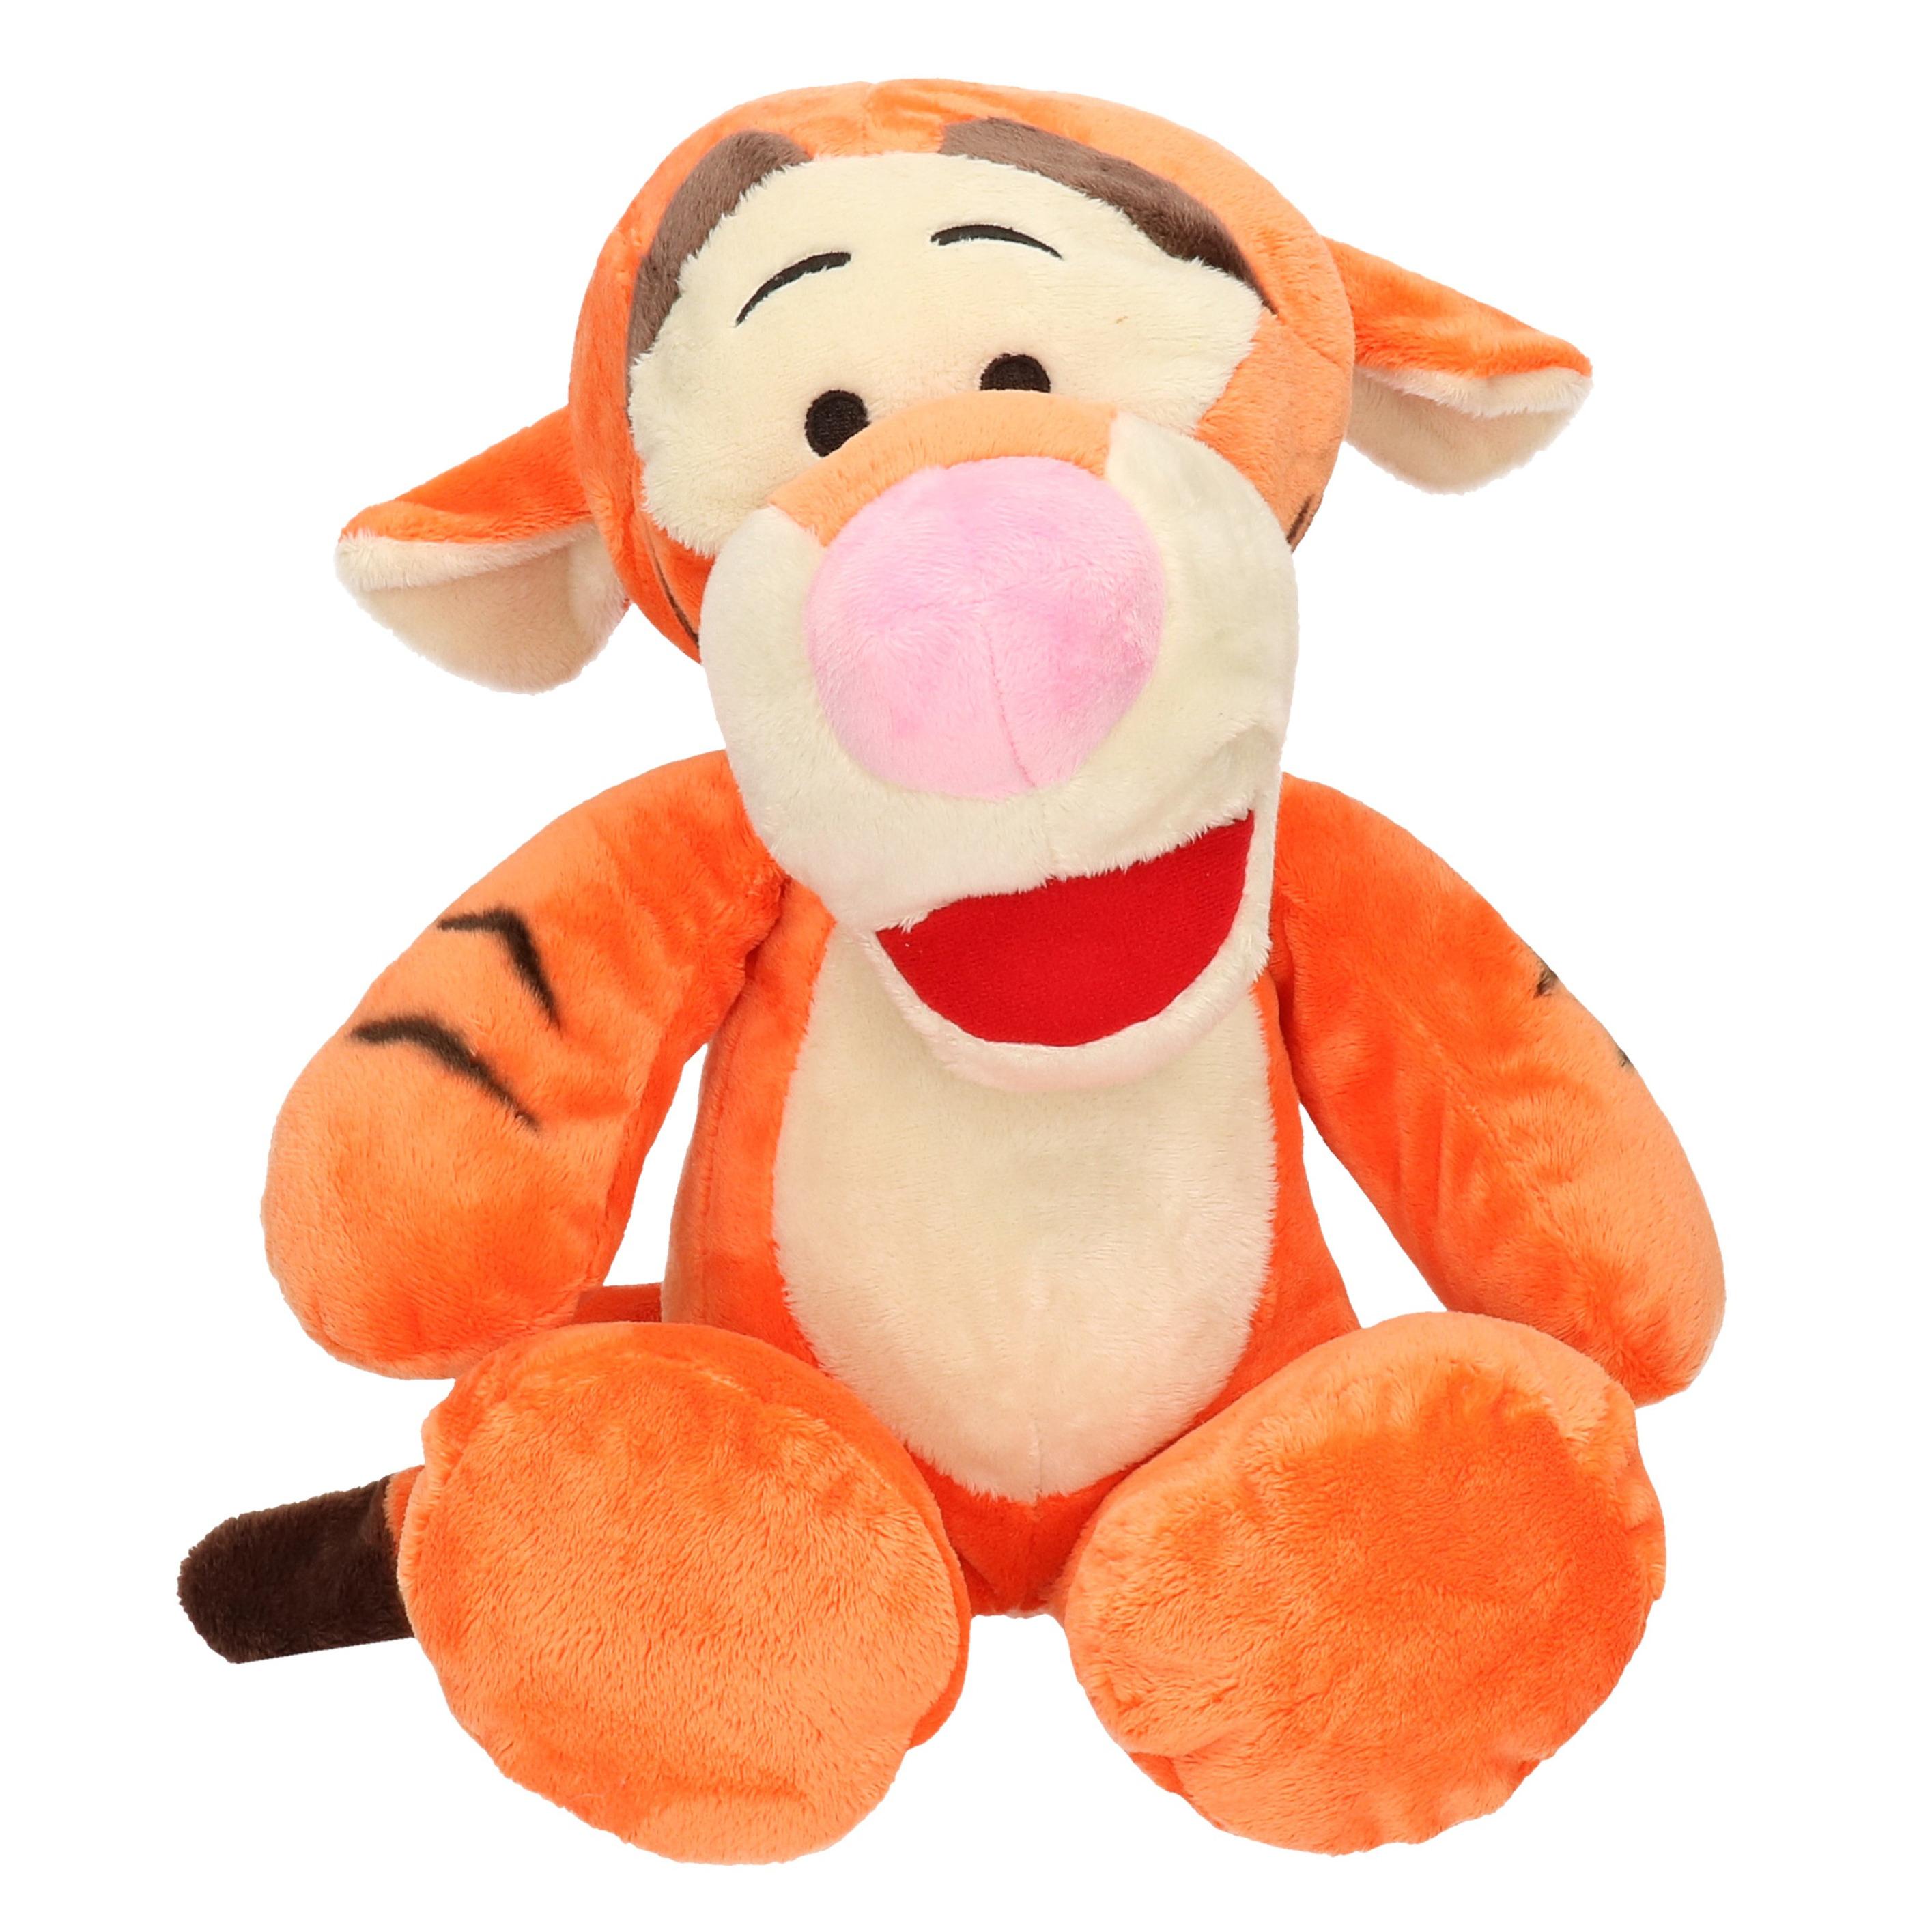 Tijgers speelgoed artikelen Disney Winnie de Poeh knuffelbeest Teigetje 34 cm